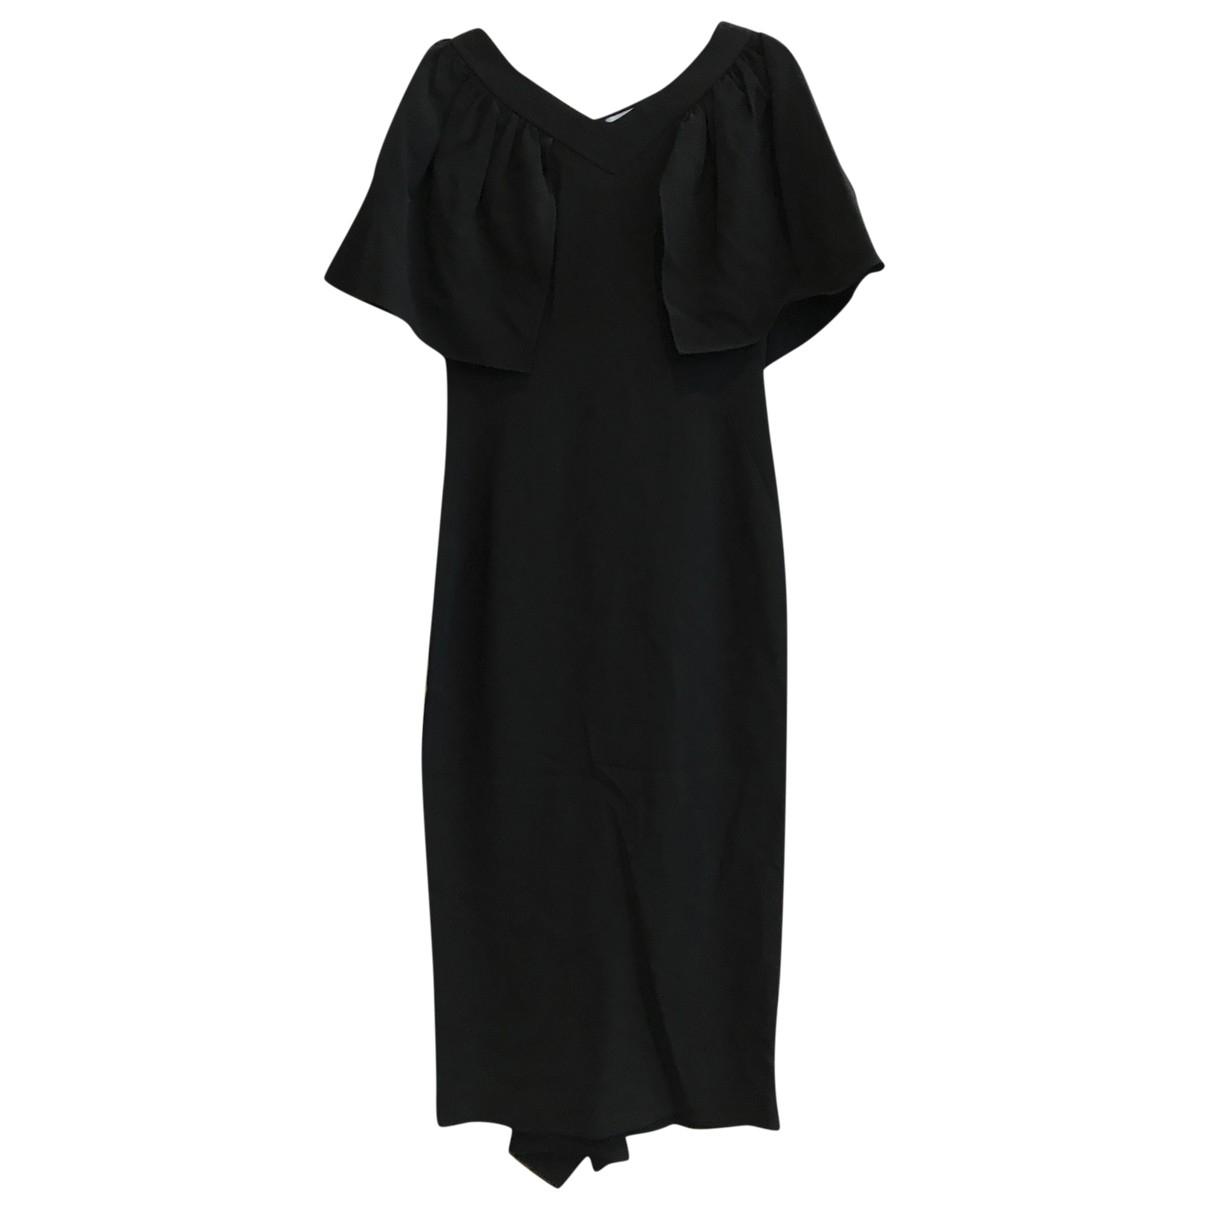 Osman London \N Kleid in  Schwarz Viskose